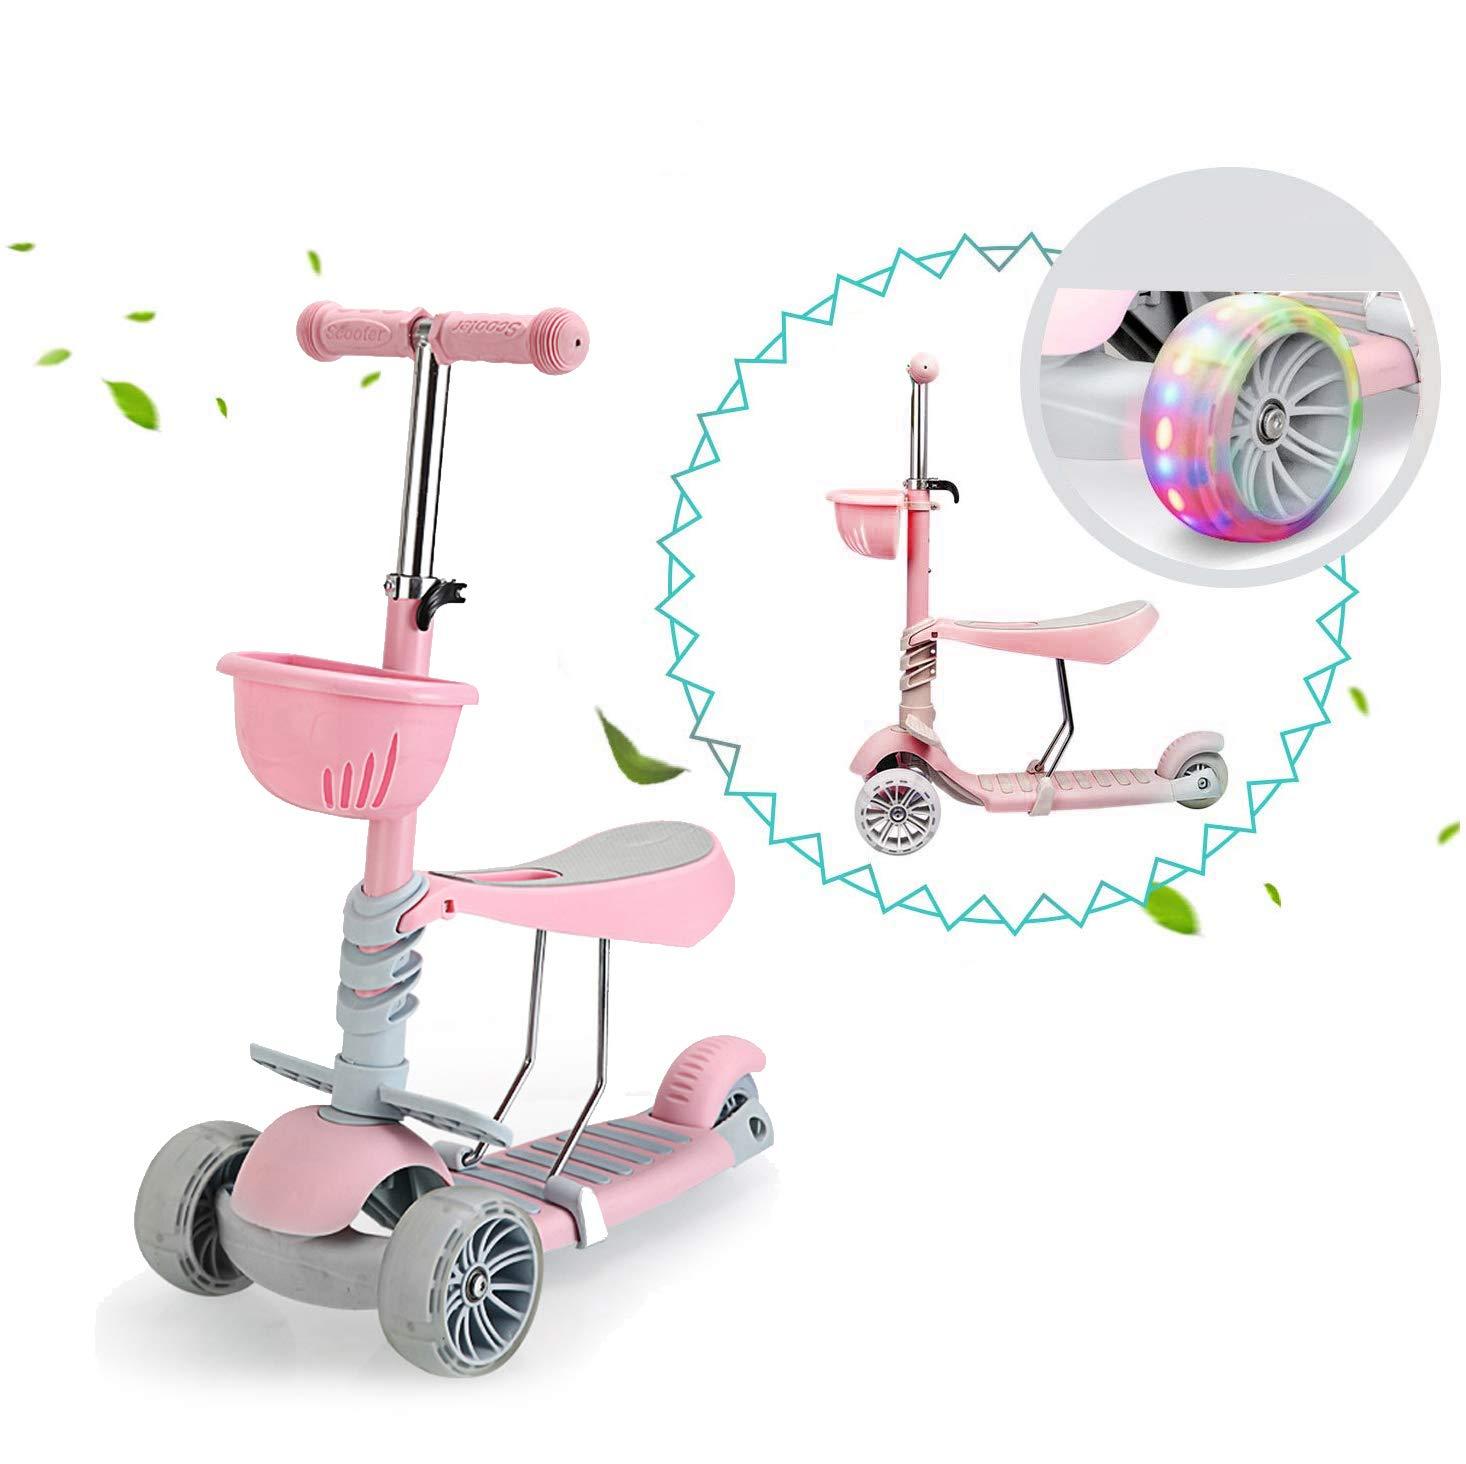 Vinteky Patinete Infantil para Niños de 2-8 Años, Patinete 3 Ruedas PU LED Luces (Rosa)